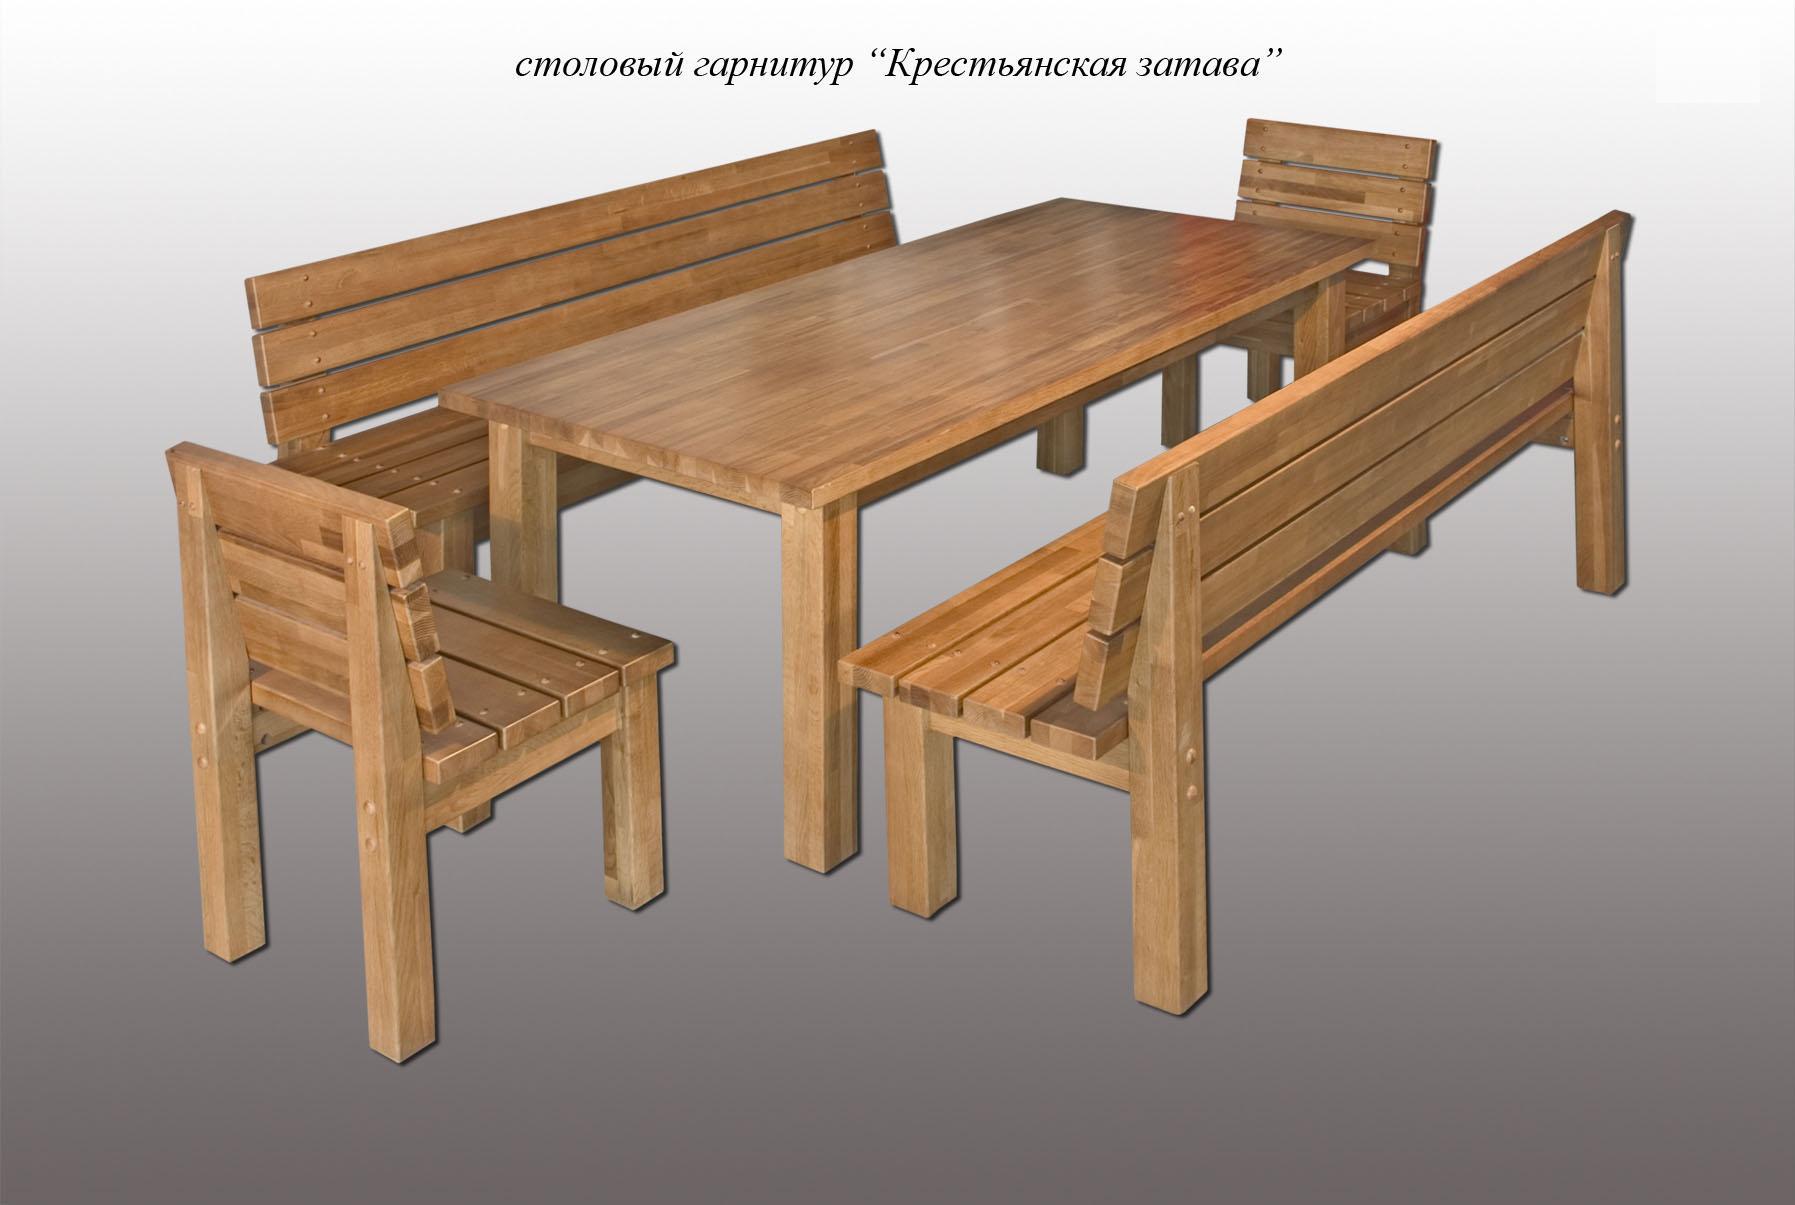 Двухстворчатый стол своими руками